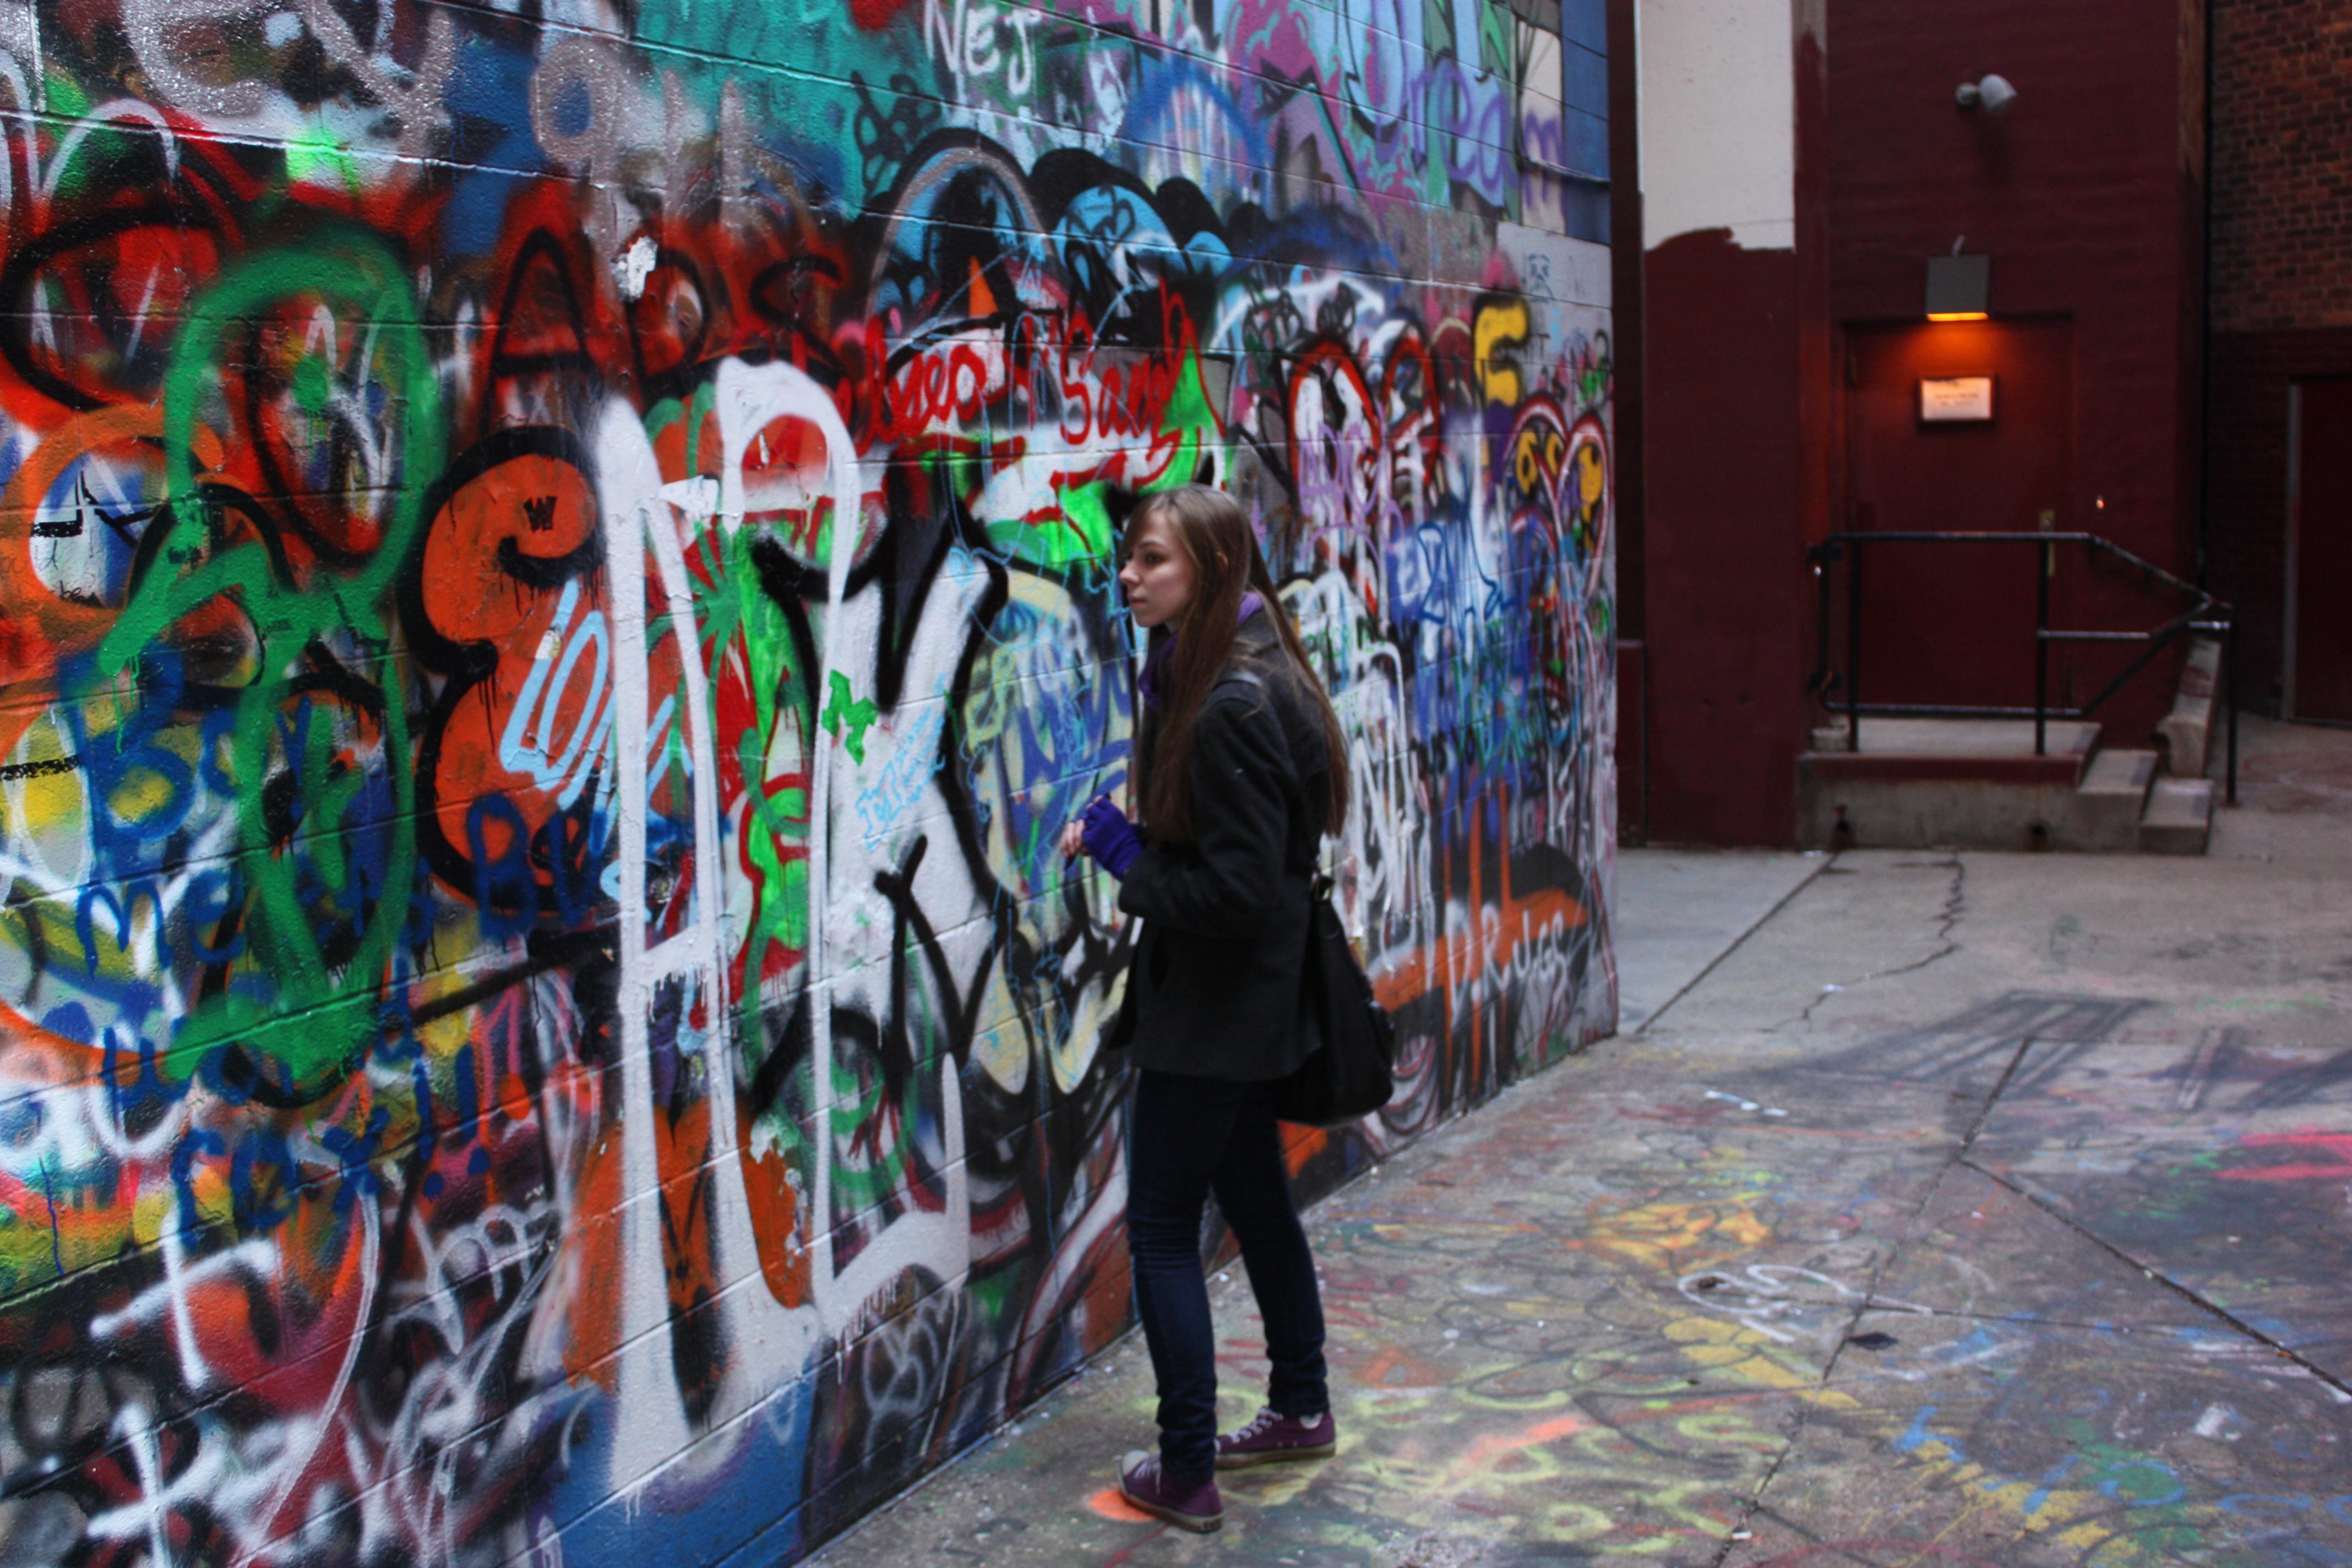 Graffiti wall ann arbor - Of